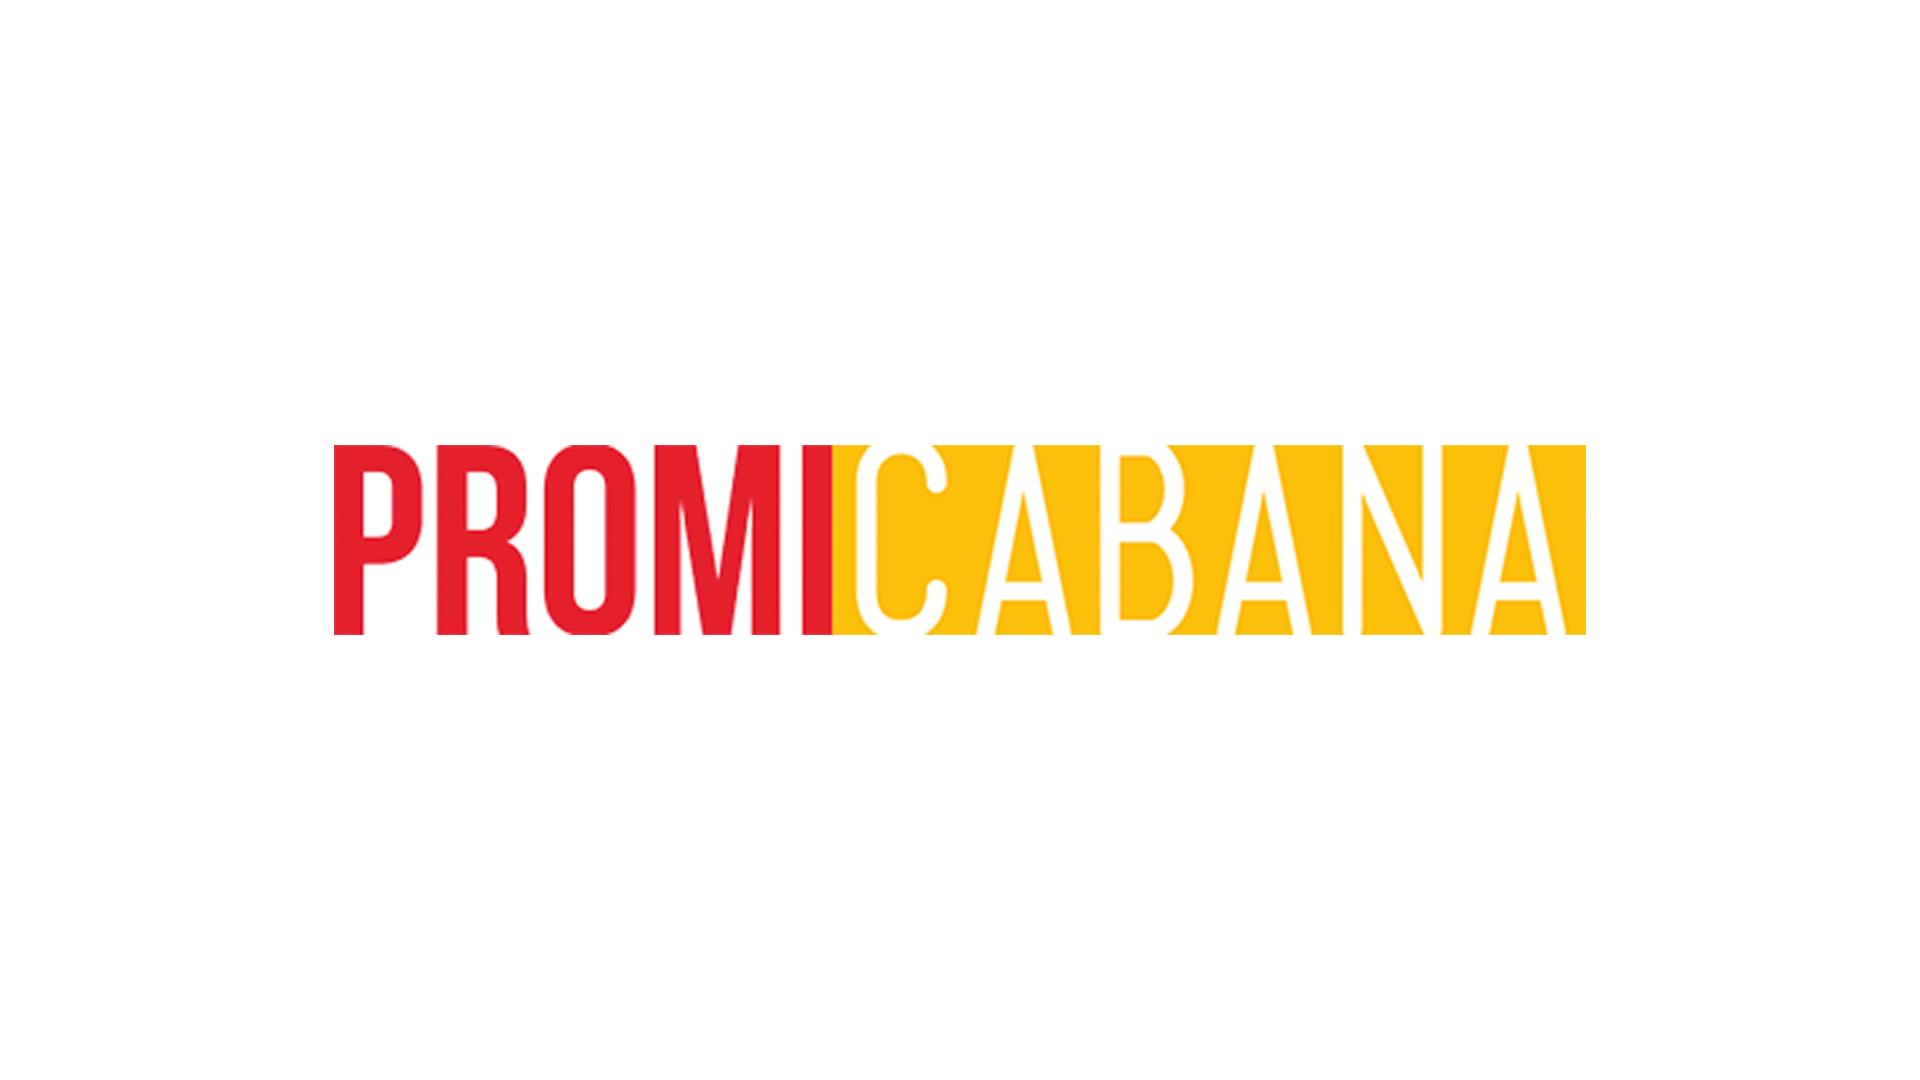 Promi-Big-Brother